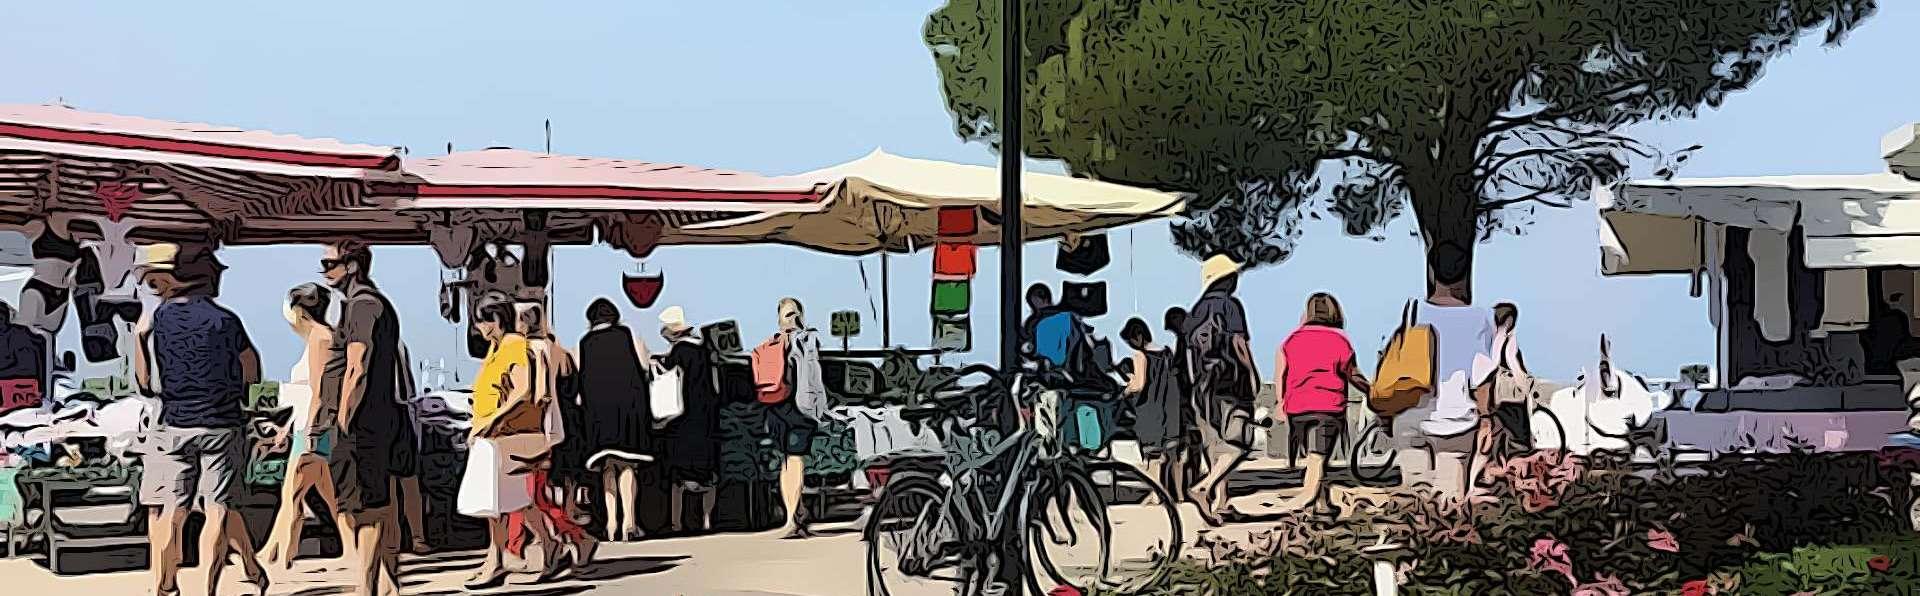 Garda Veneto   I Mercati Settimanali